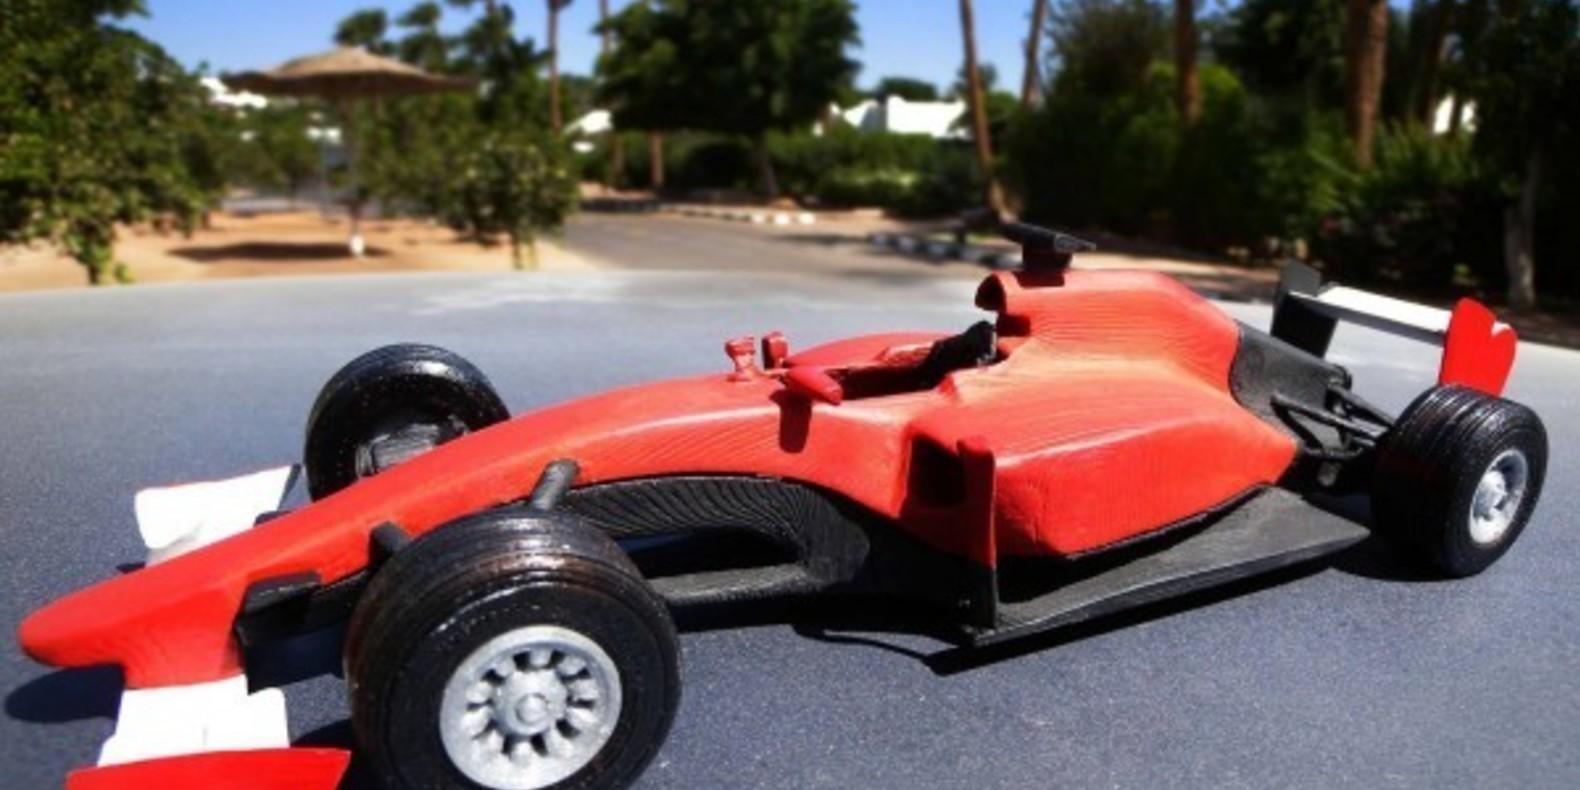 Ferrari F1 2015 mao casella maurizio 3D printed maquette model imprimé en 3D fichier STL cults 2